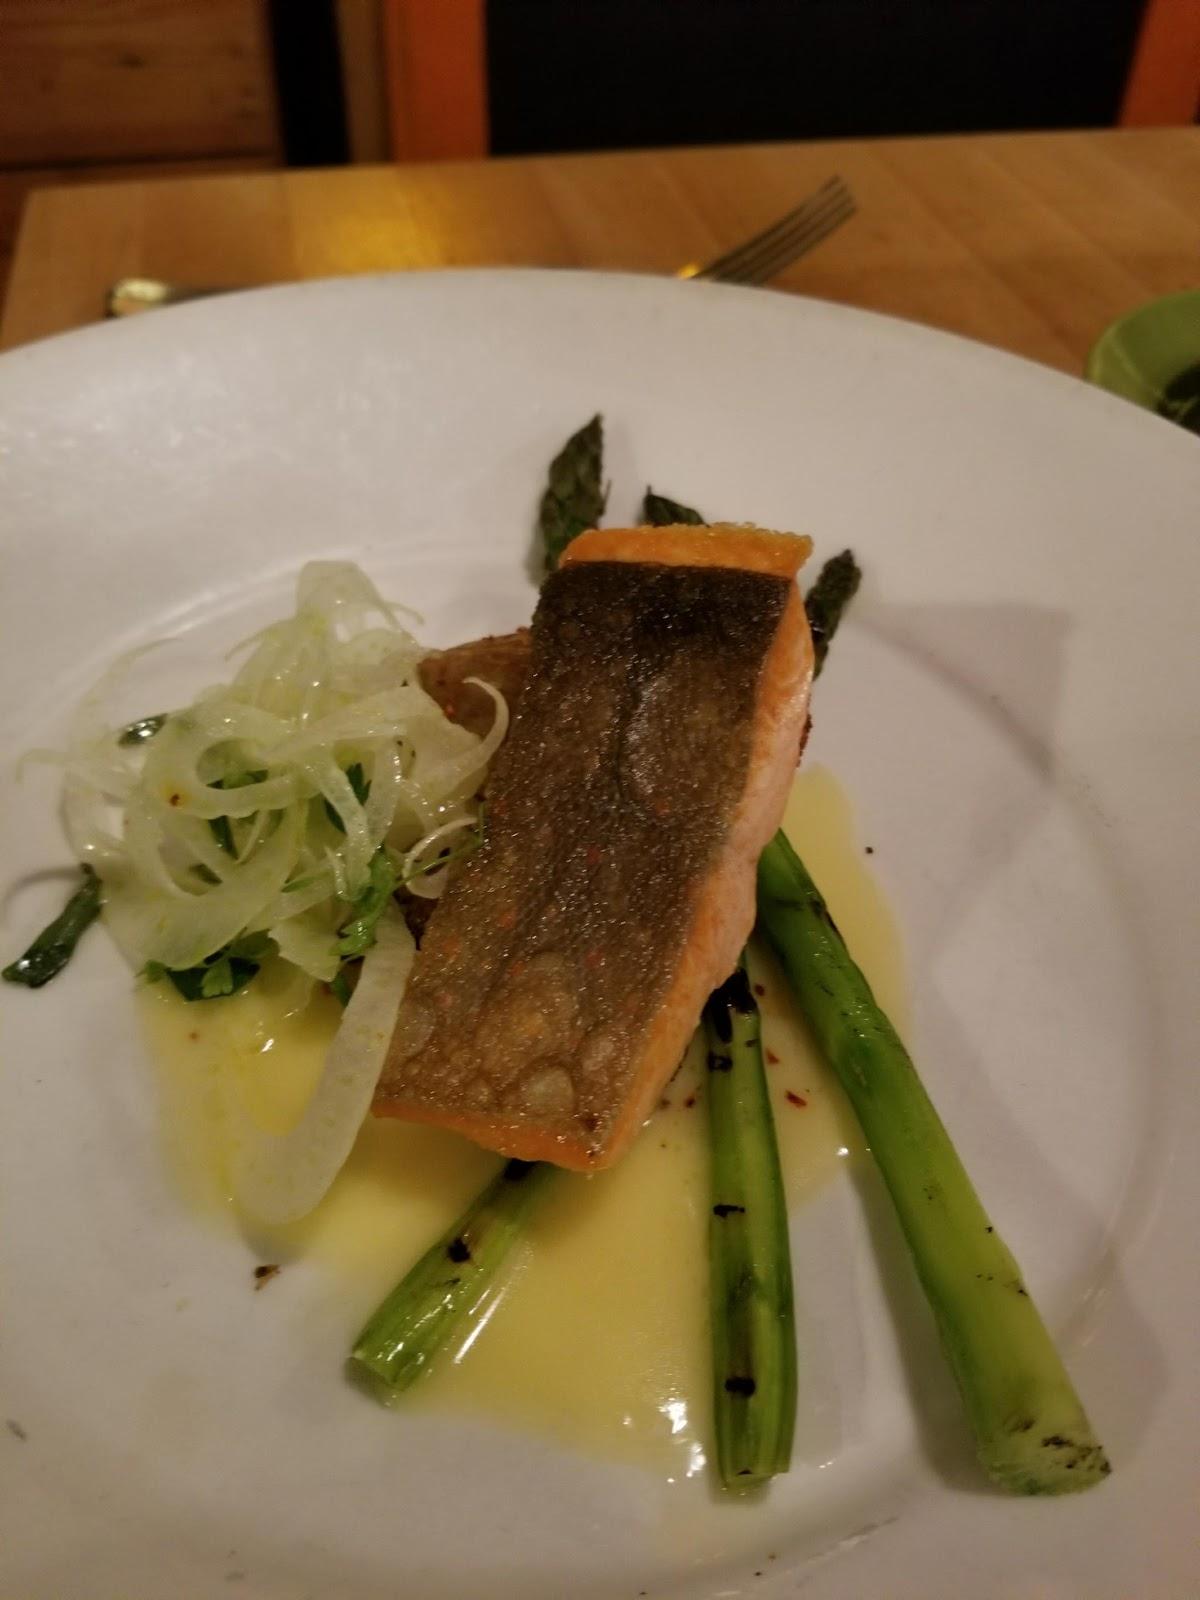 salmon capitol hill kfclovesyou foodie blogger